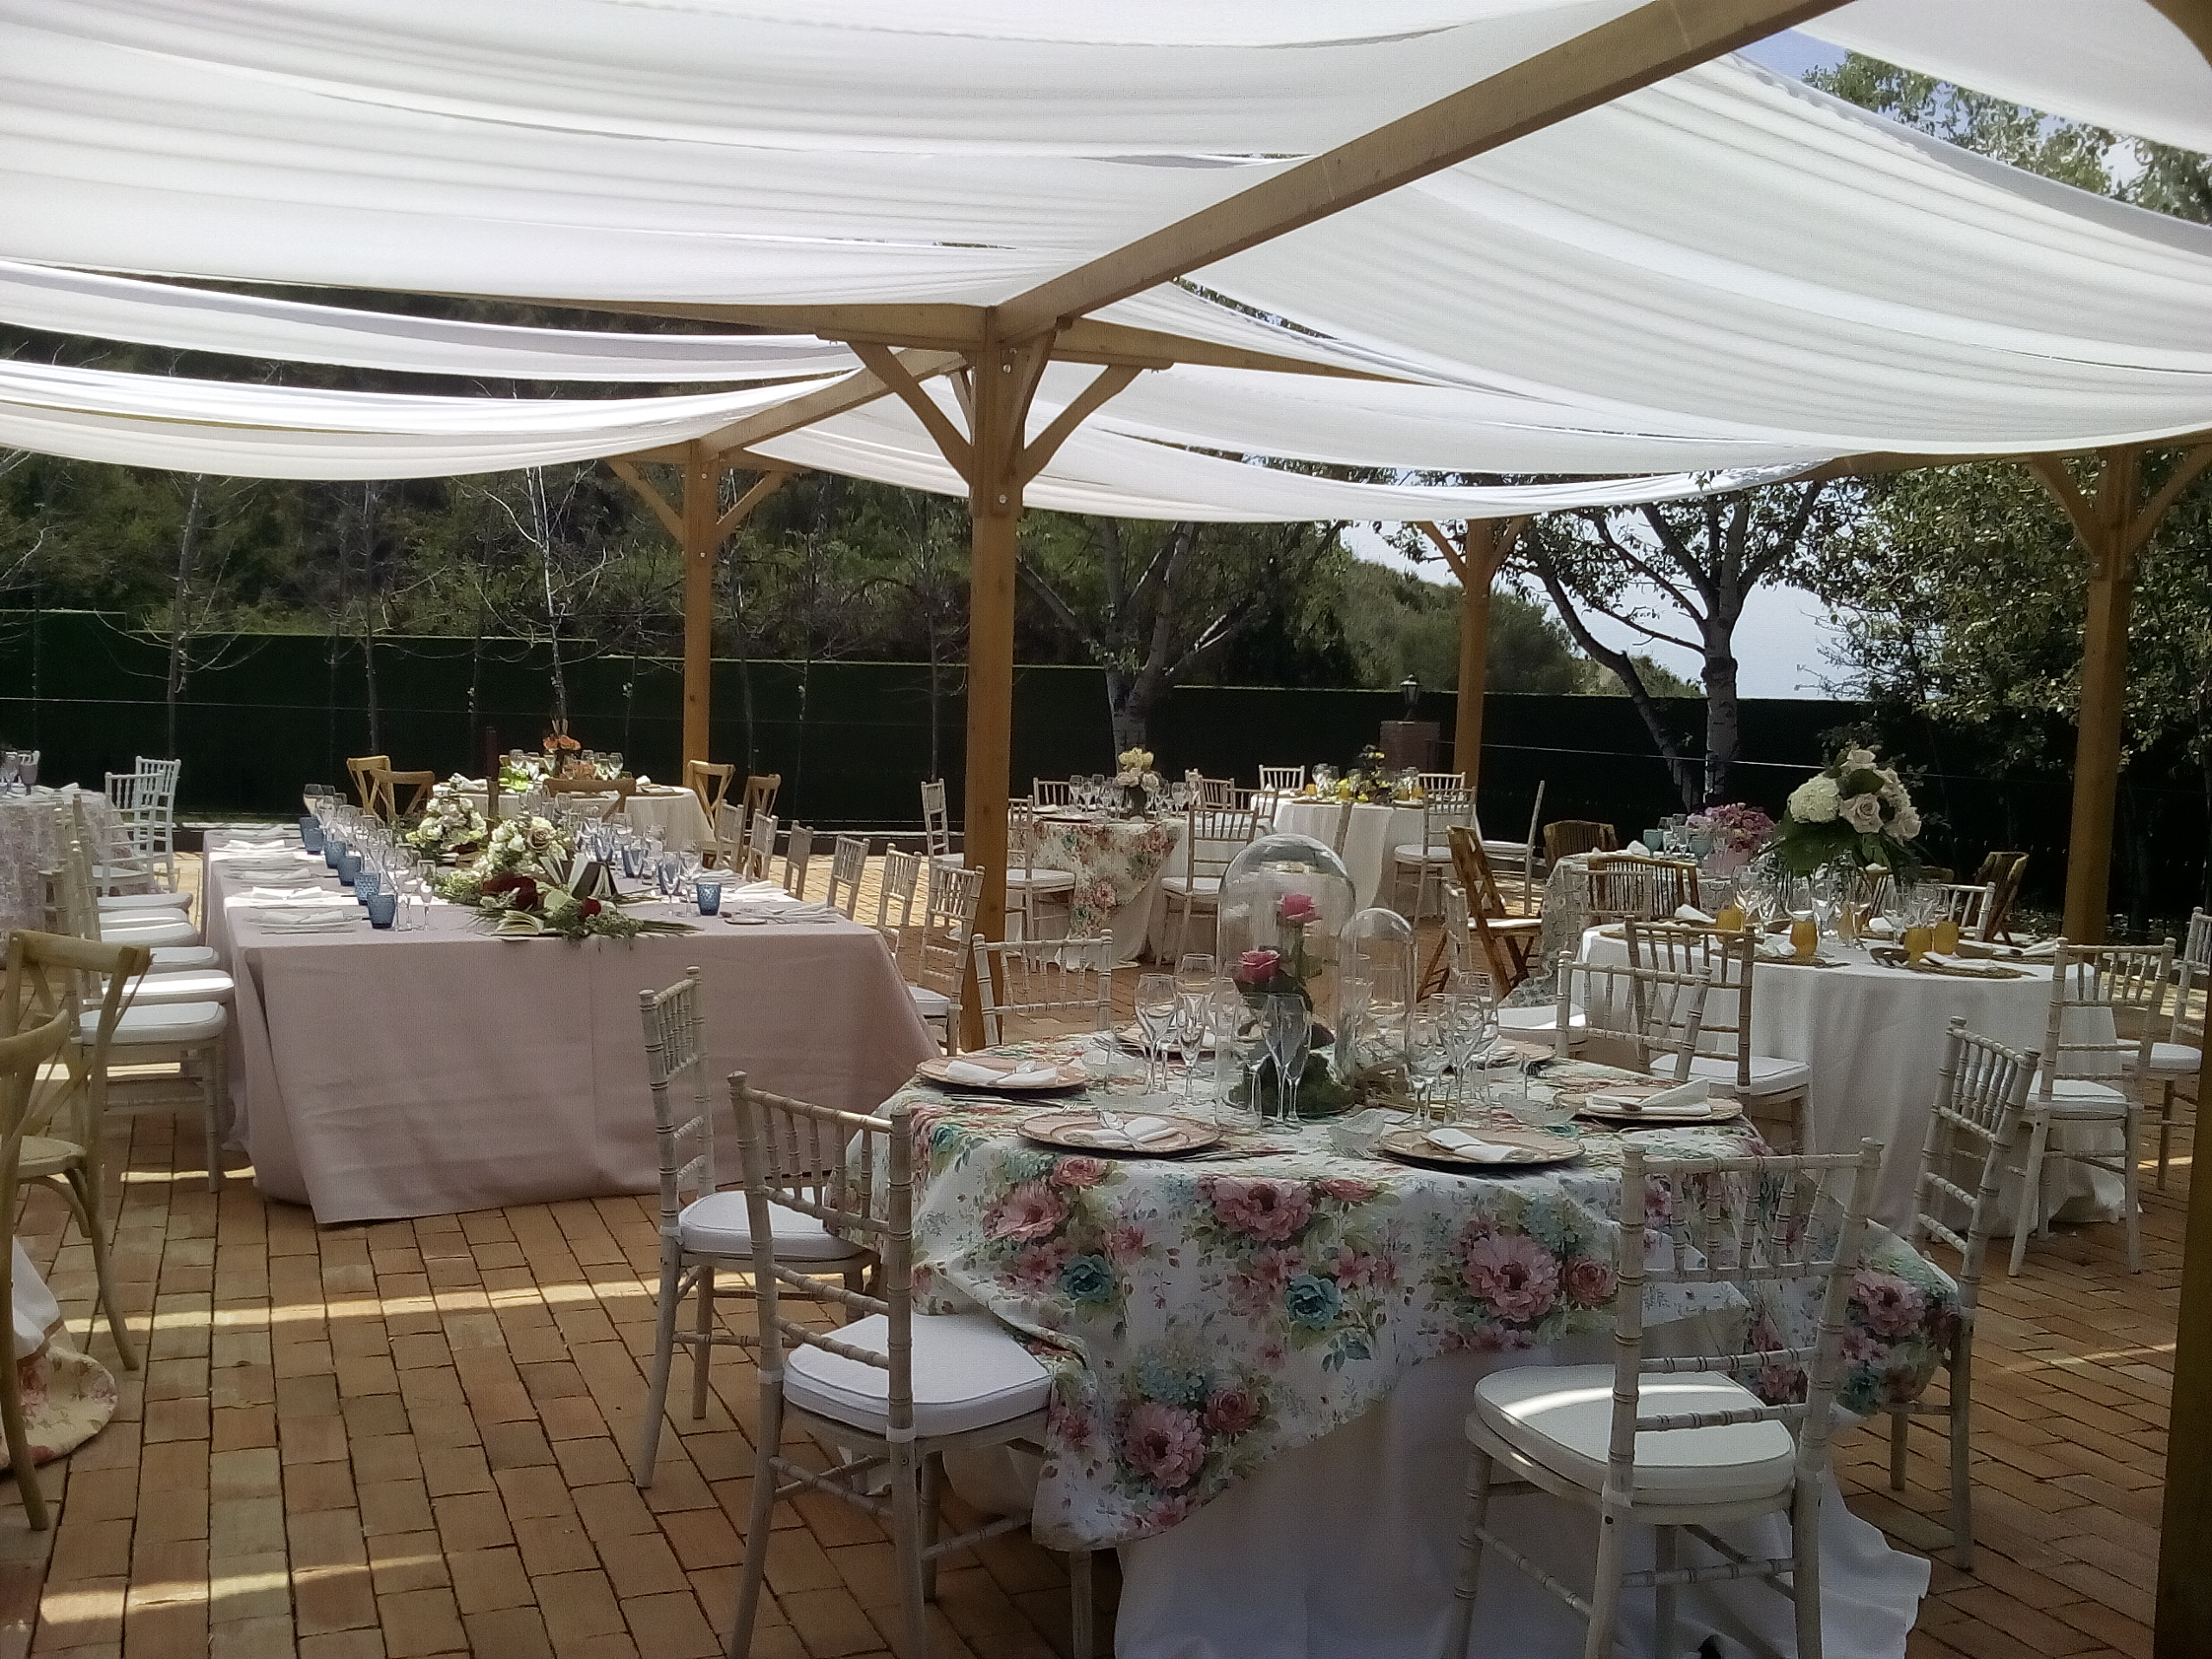 Luxury drapes frame fairy-tale wedding decor in the unique gardens